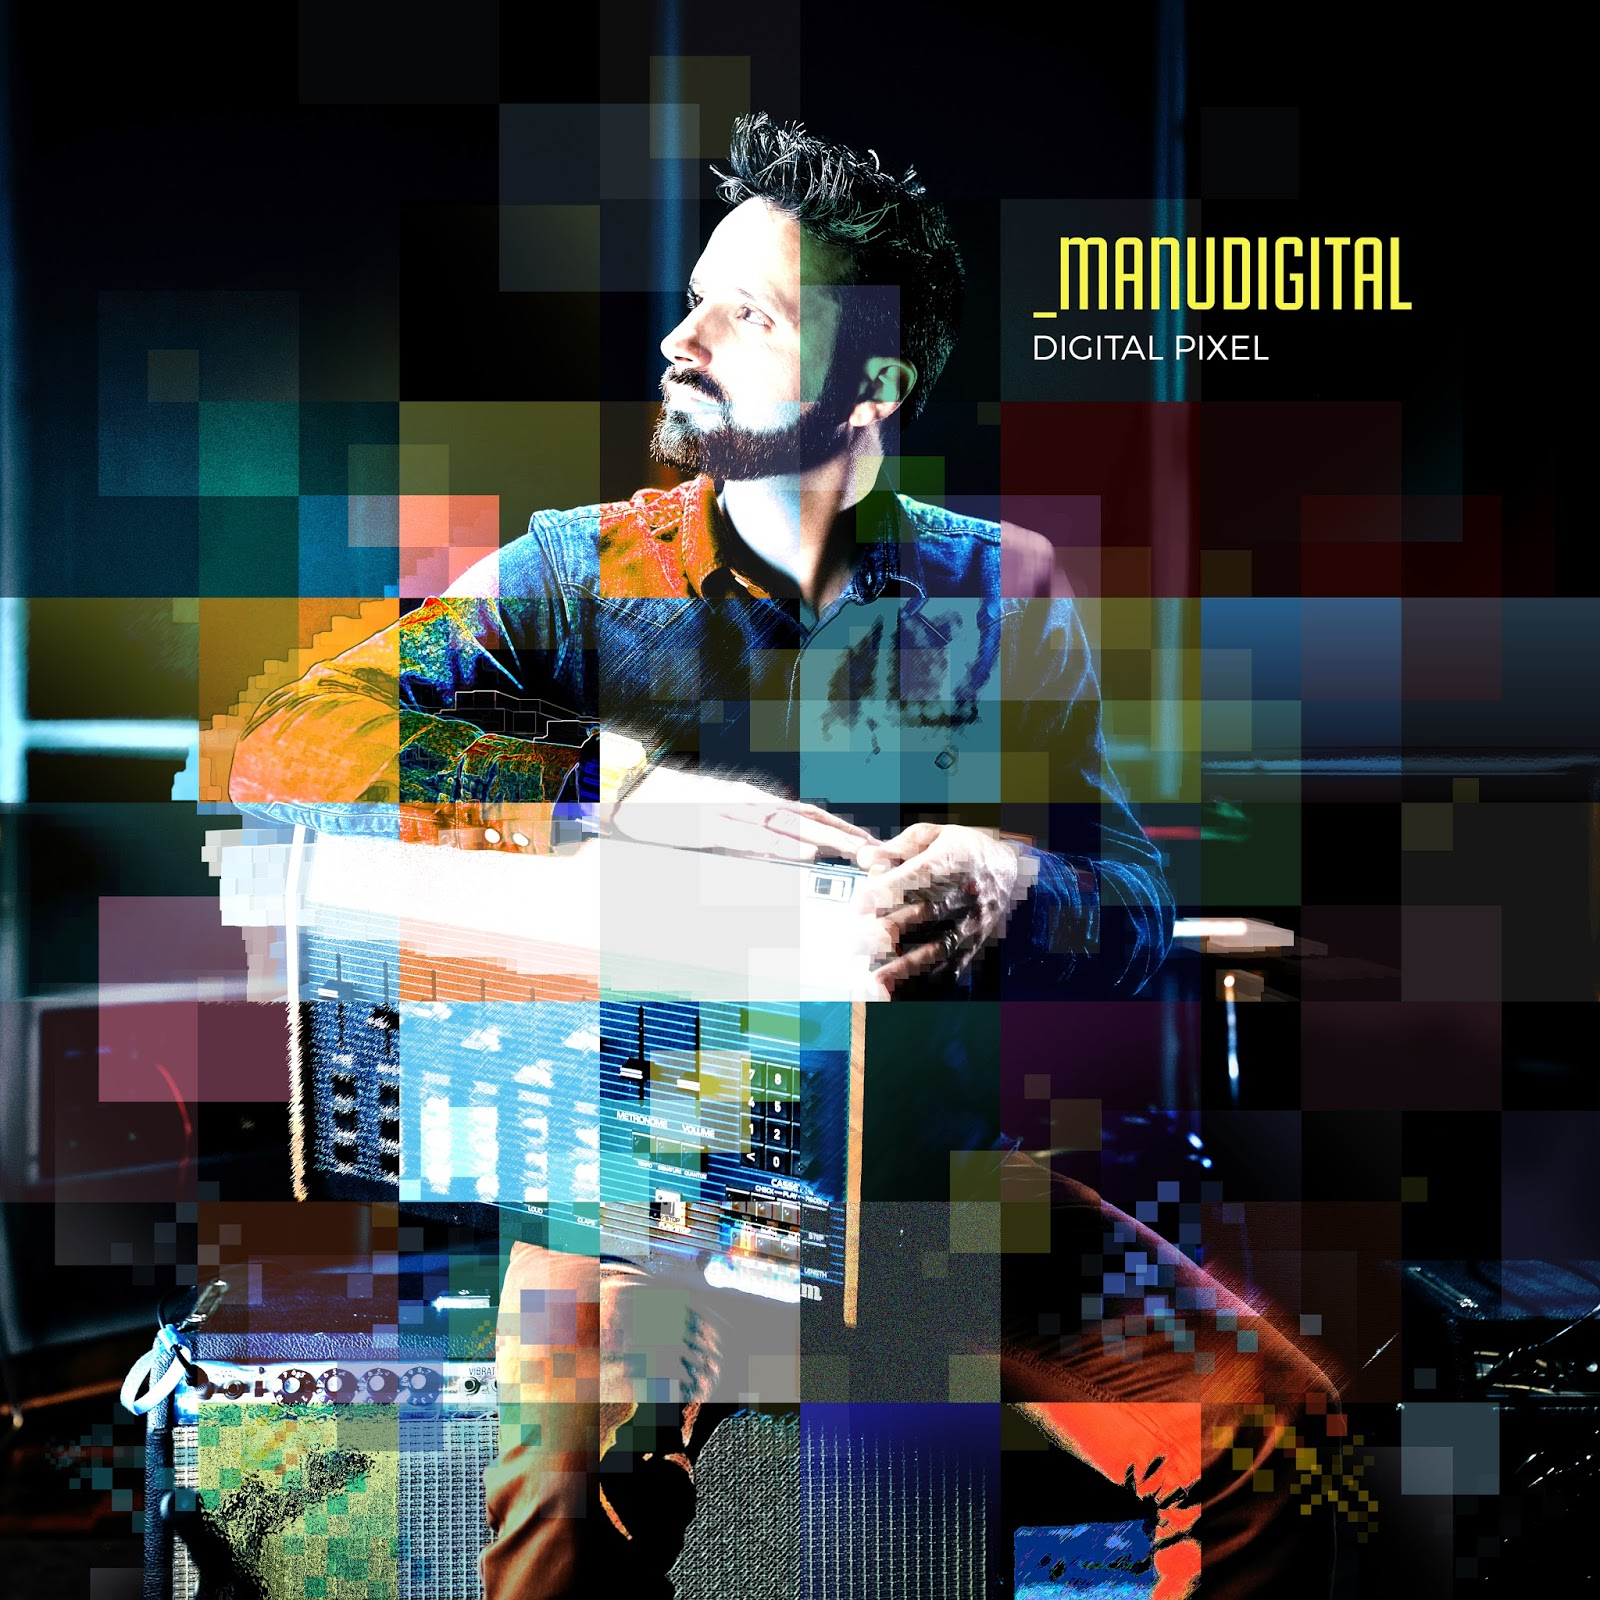 Manudigital - Digital Pixel 2016 - Rasta Reggae Sounds